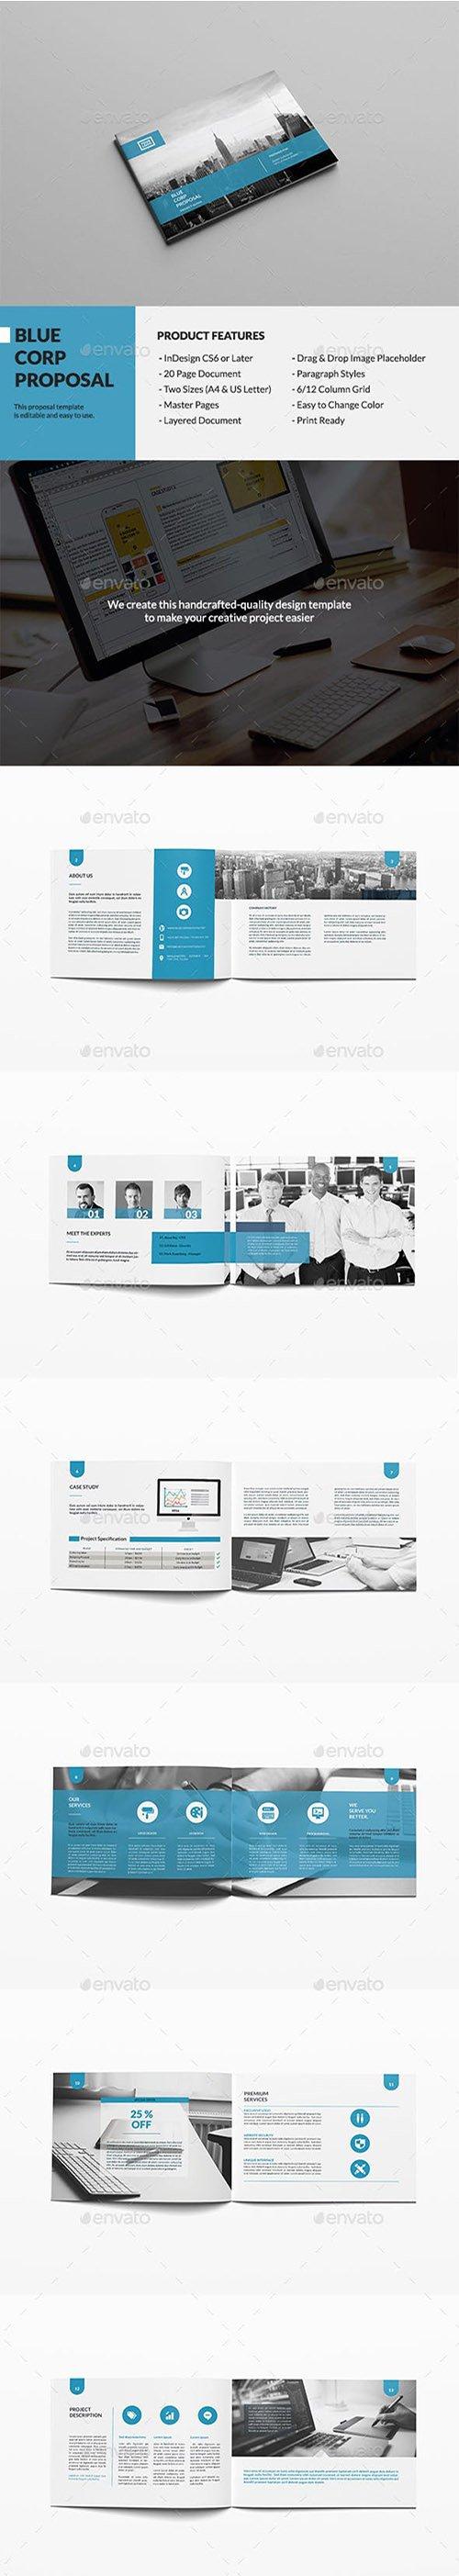 GR - Blue Corp Proposal 13750355